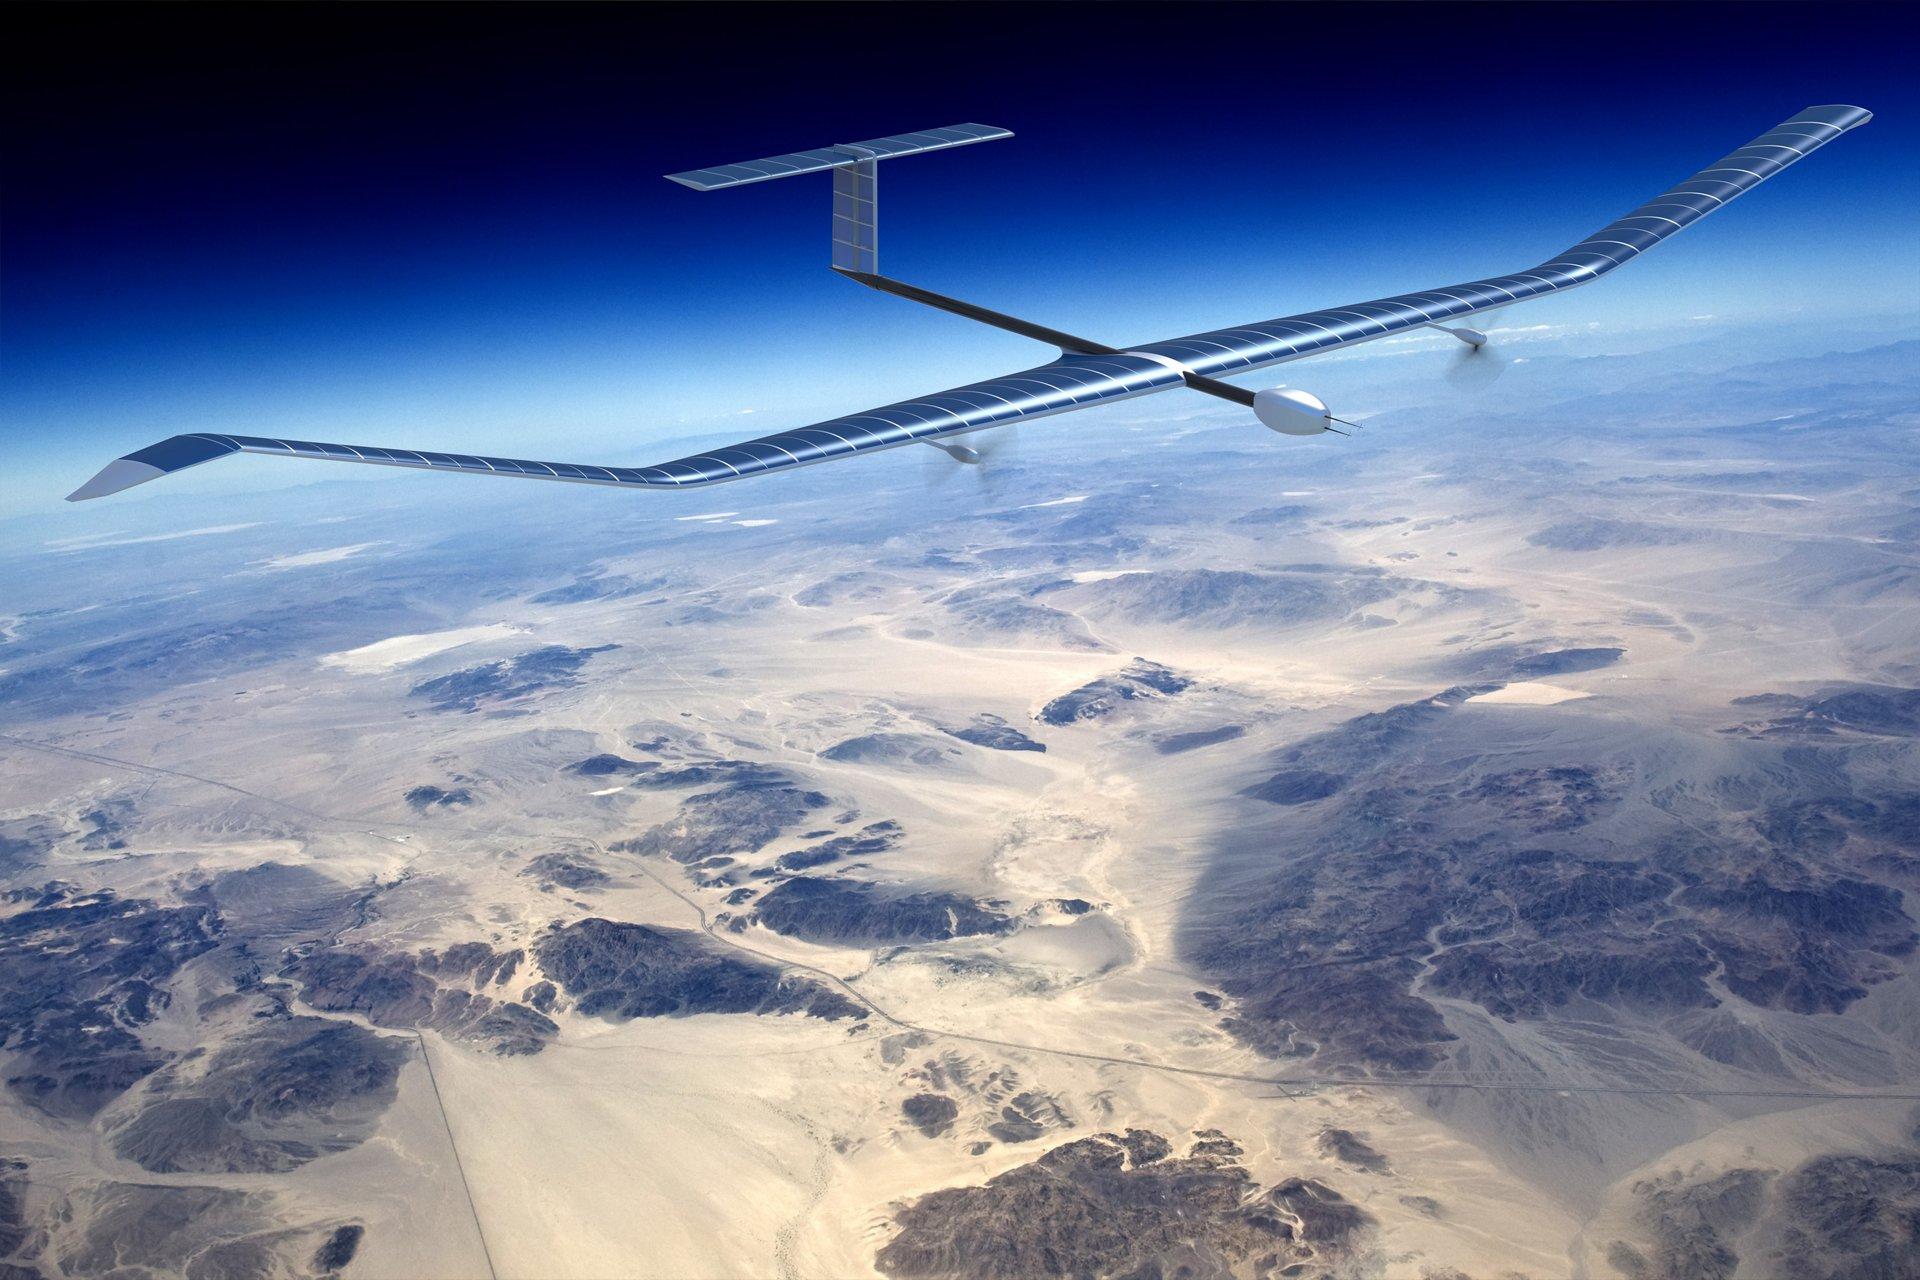 A representation of Airbus' Zephyr high-altitude pseudo-satellite (HAPS) in flight.